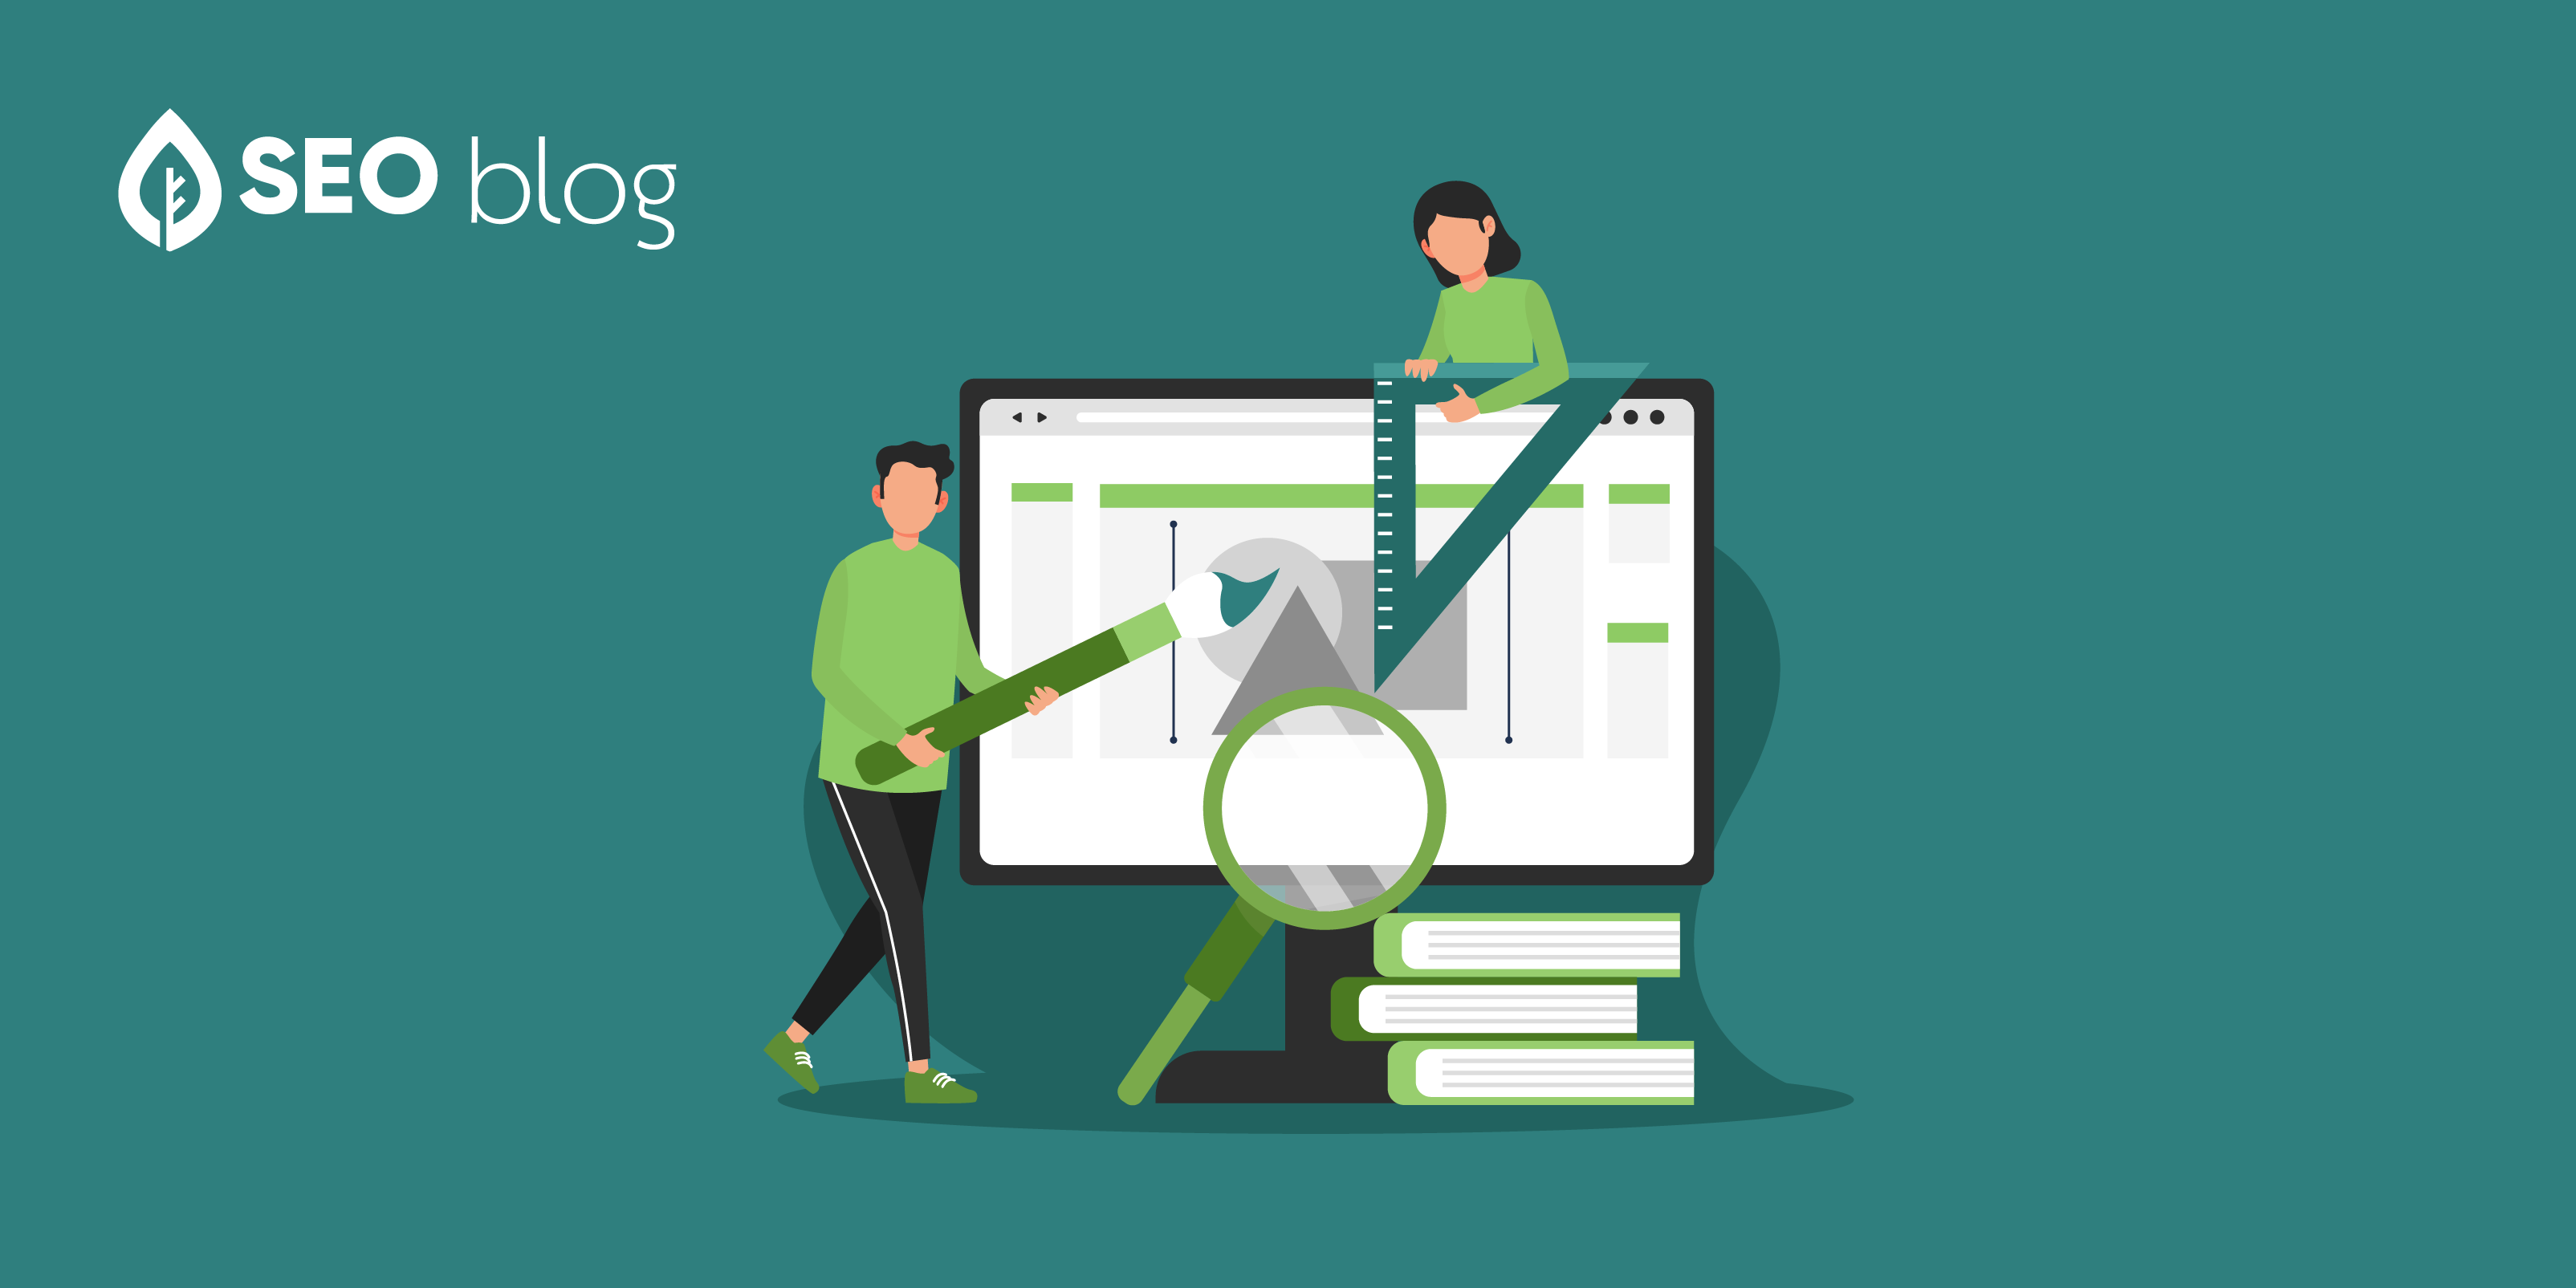 Seoblog 5 Web Design Strategies Sure to Make You Look Good